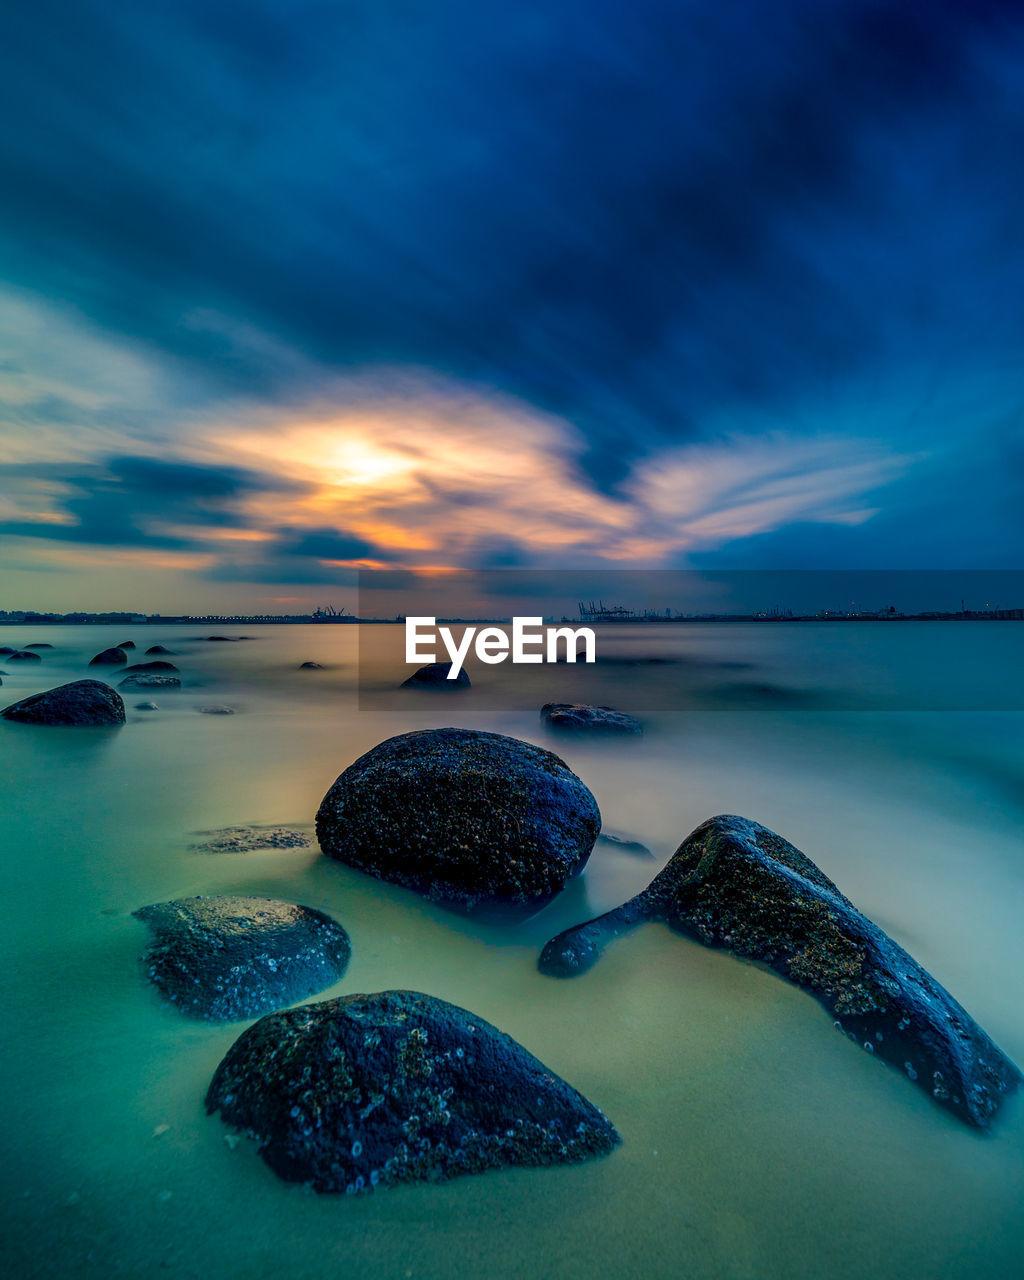 ROCKS IN SEA AGAINST SUNSET SKY